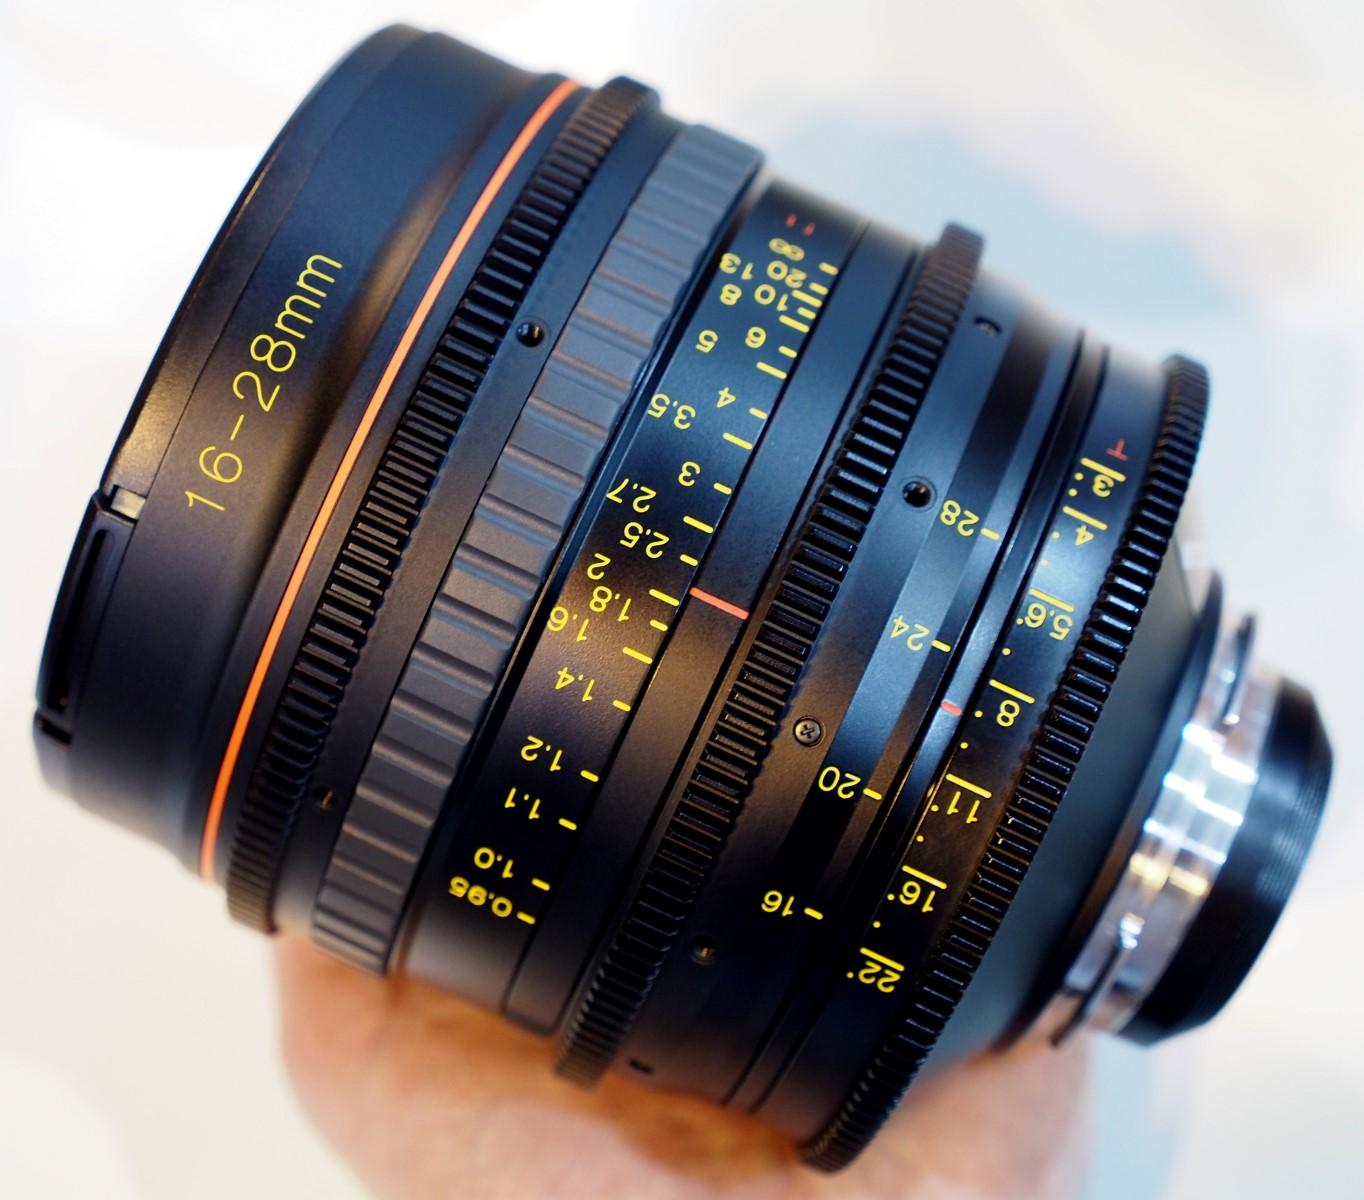 Tokina 16-28mm 11-16mm Cine Lens Hands-On | ePHOTOzine